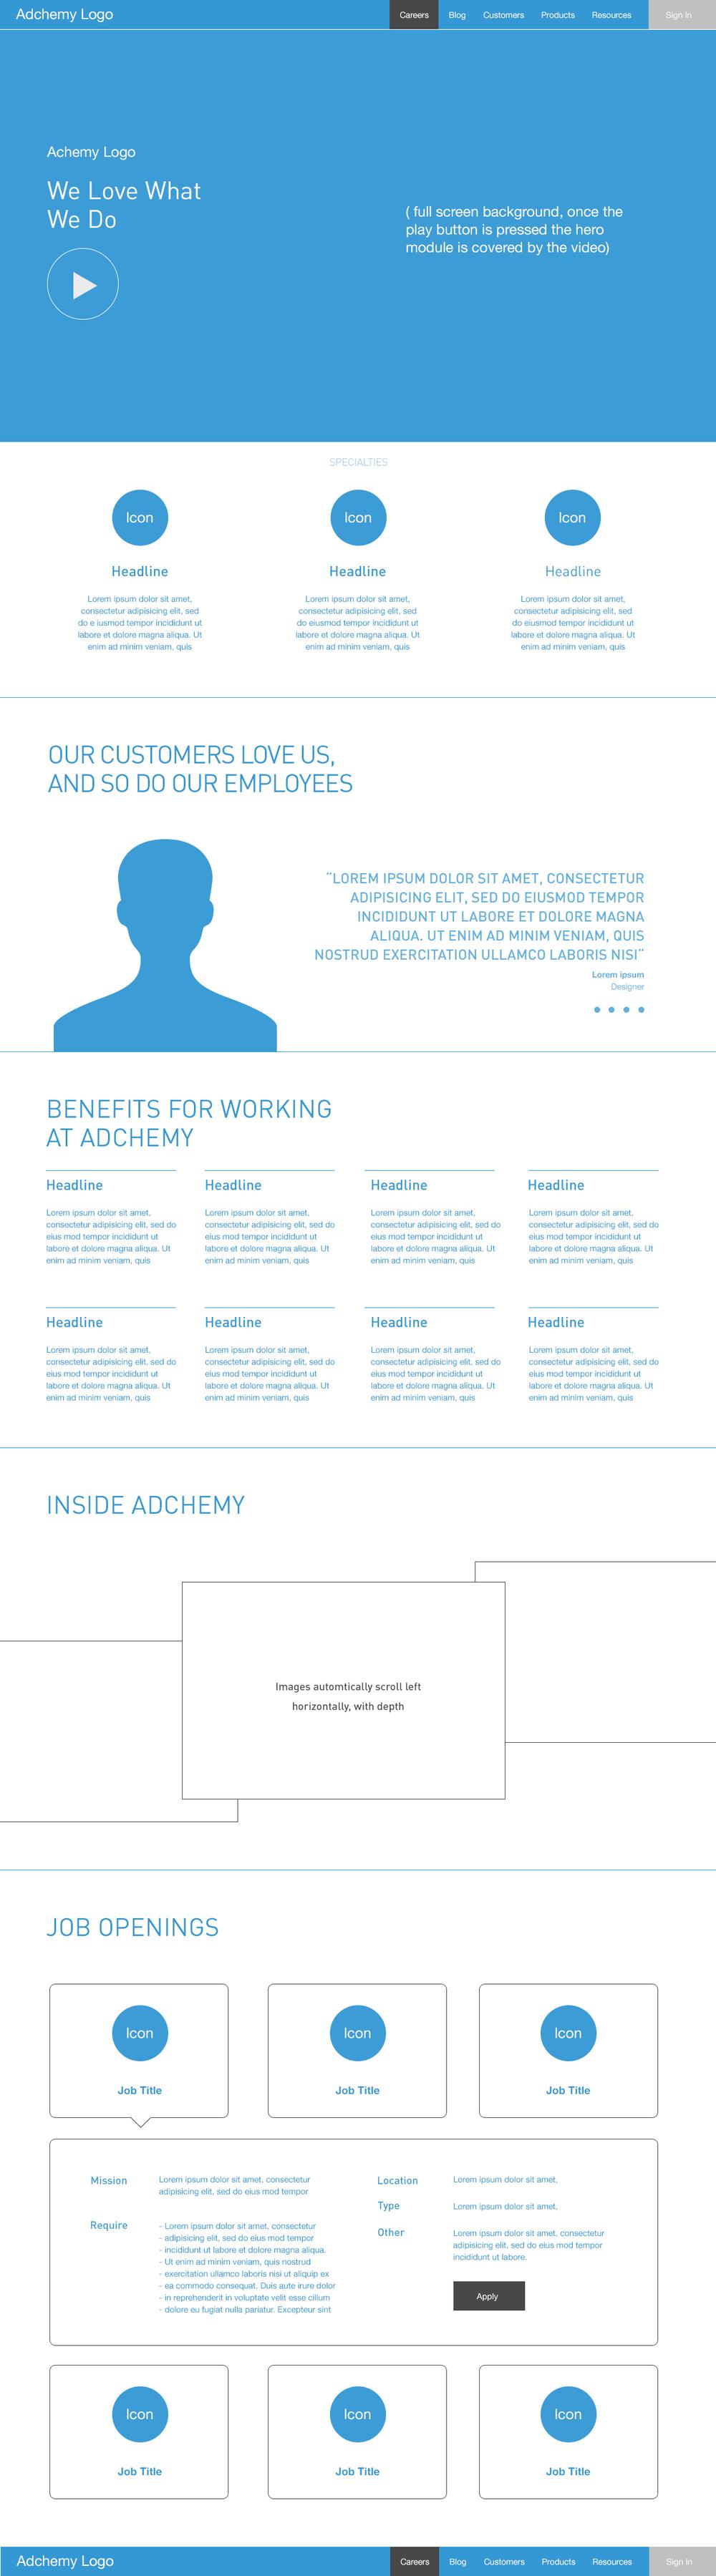 Adchemy_wireframe_Careers.jpg